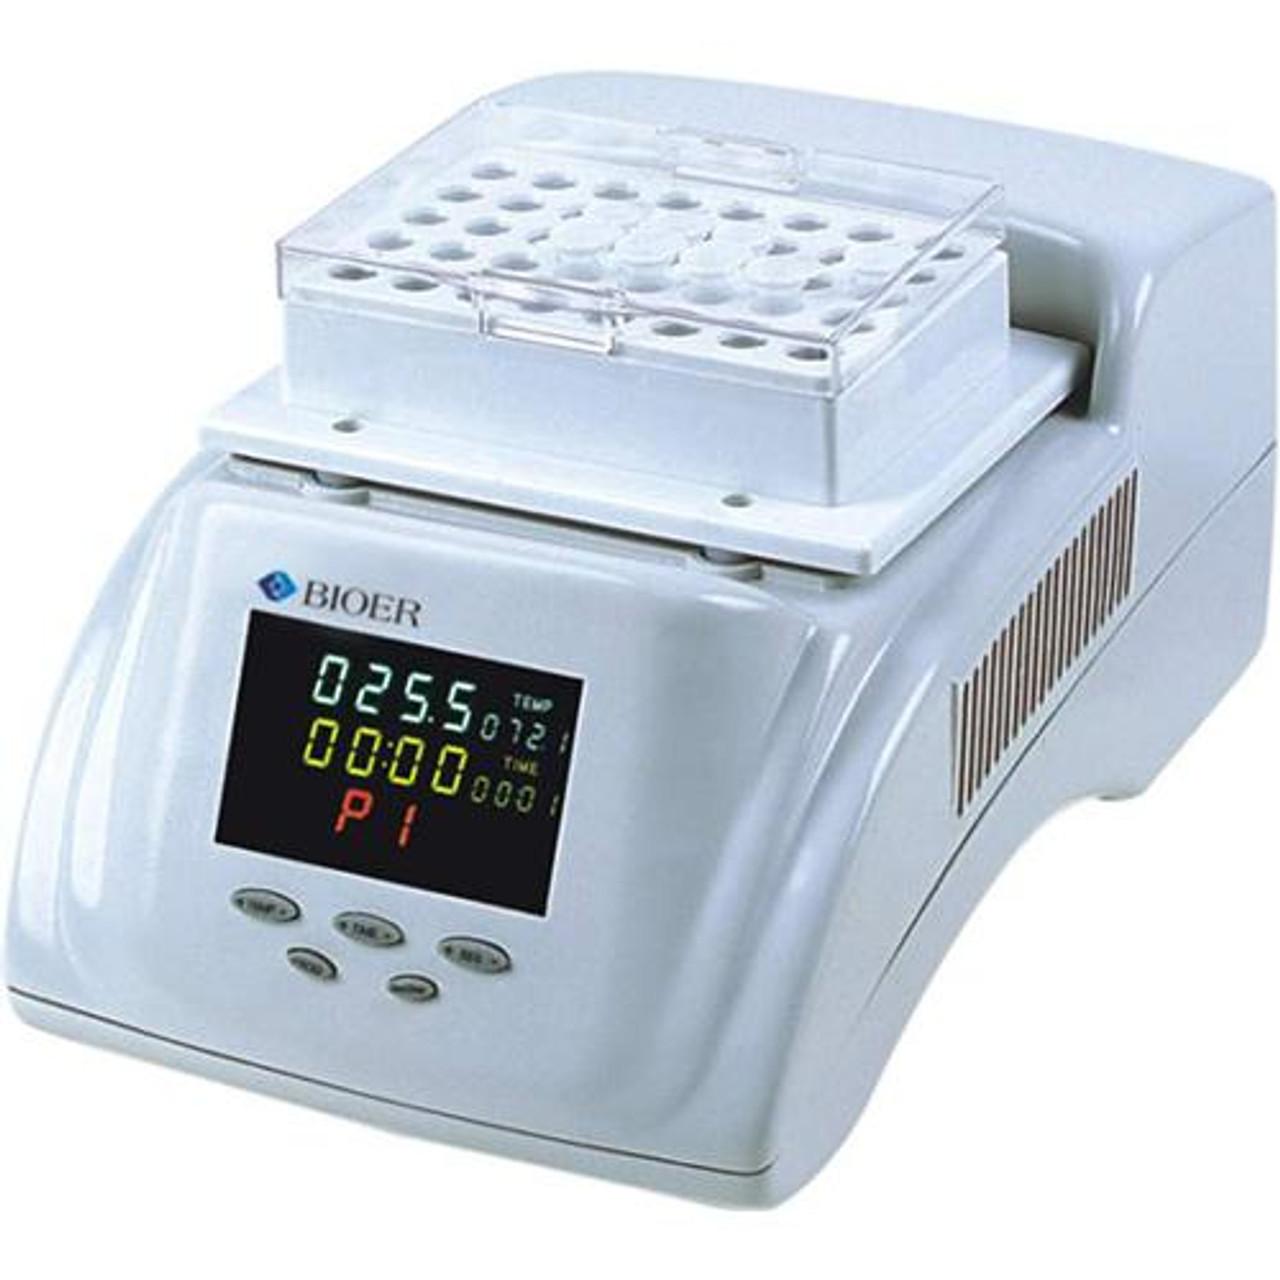 Bioer ThermoCell Heating Dry Bath. Temp: Room+5 ~100 ºC,  Volt: 110 Volt - 60Hz